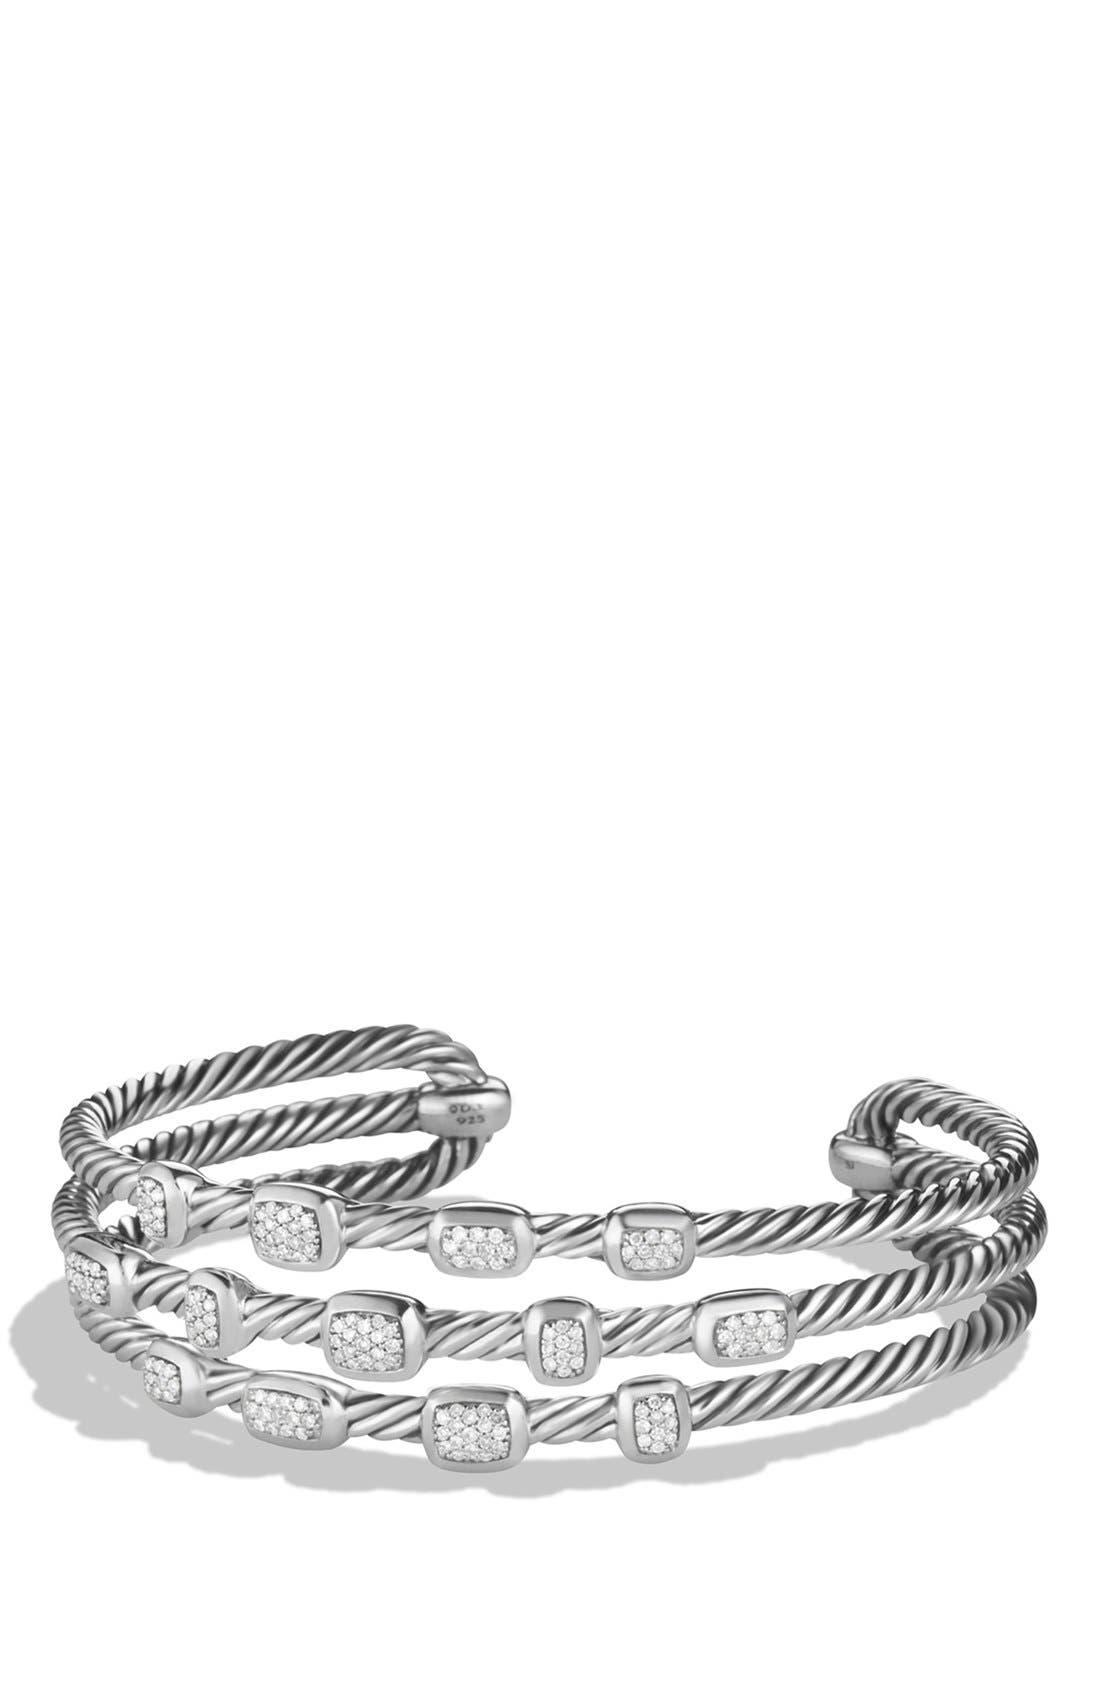 David Yurman 'Confetti' Narrow Cuff Bracelet with Diamond